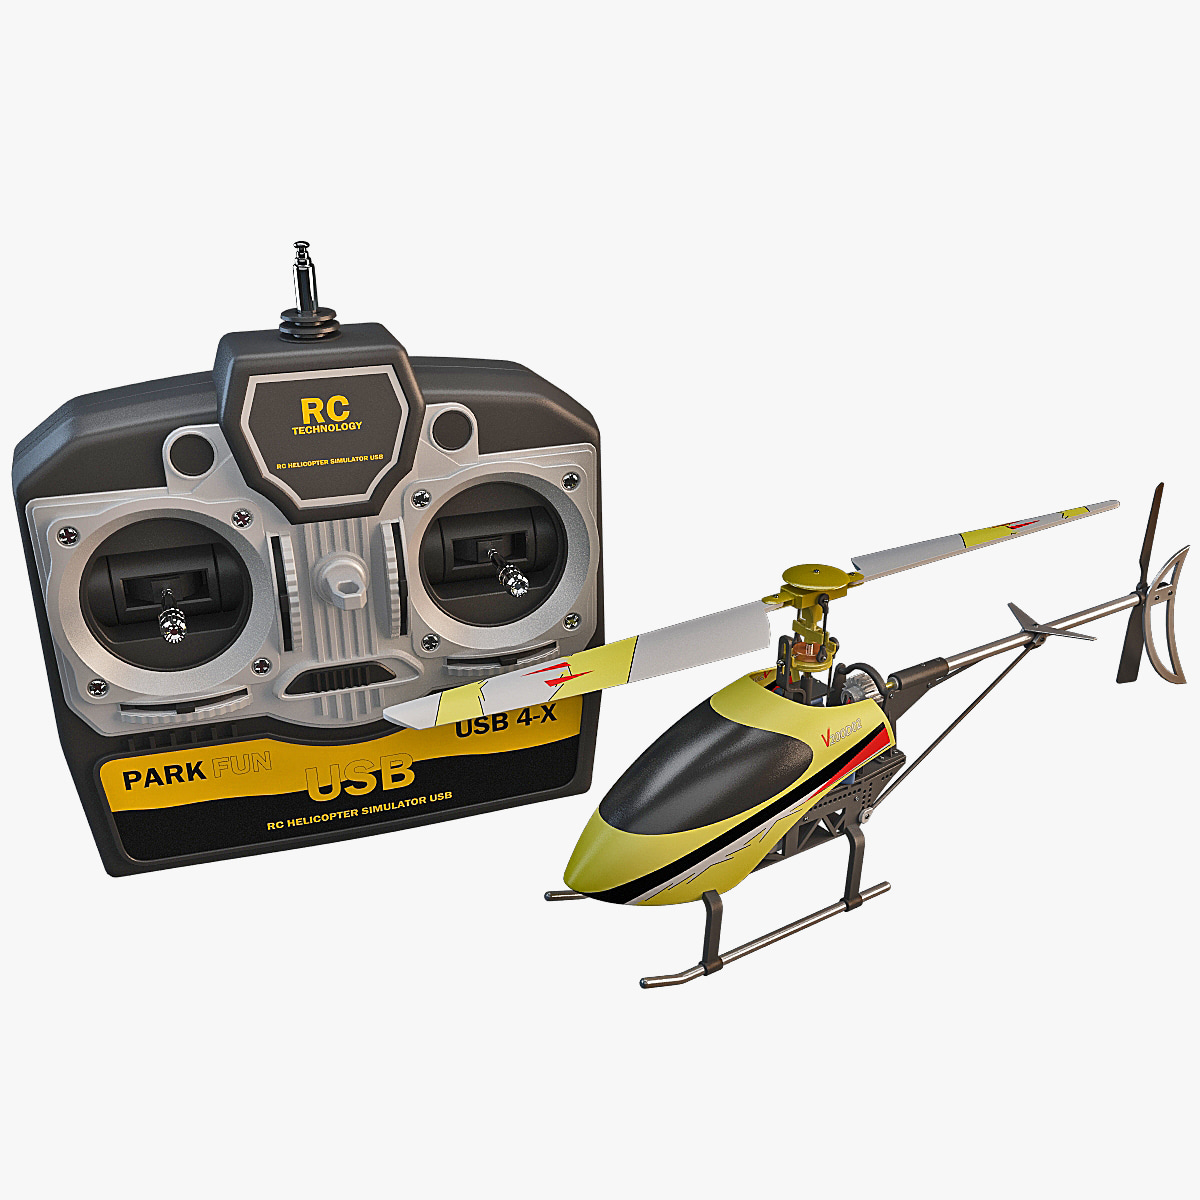 Mini_Helicopter_Walkera_Set_000.jpg